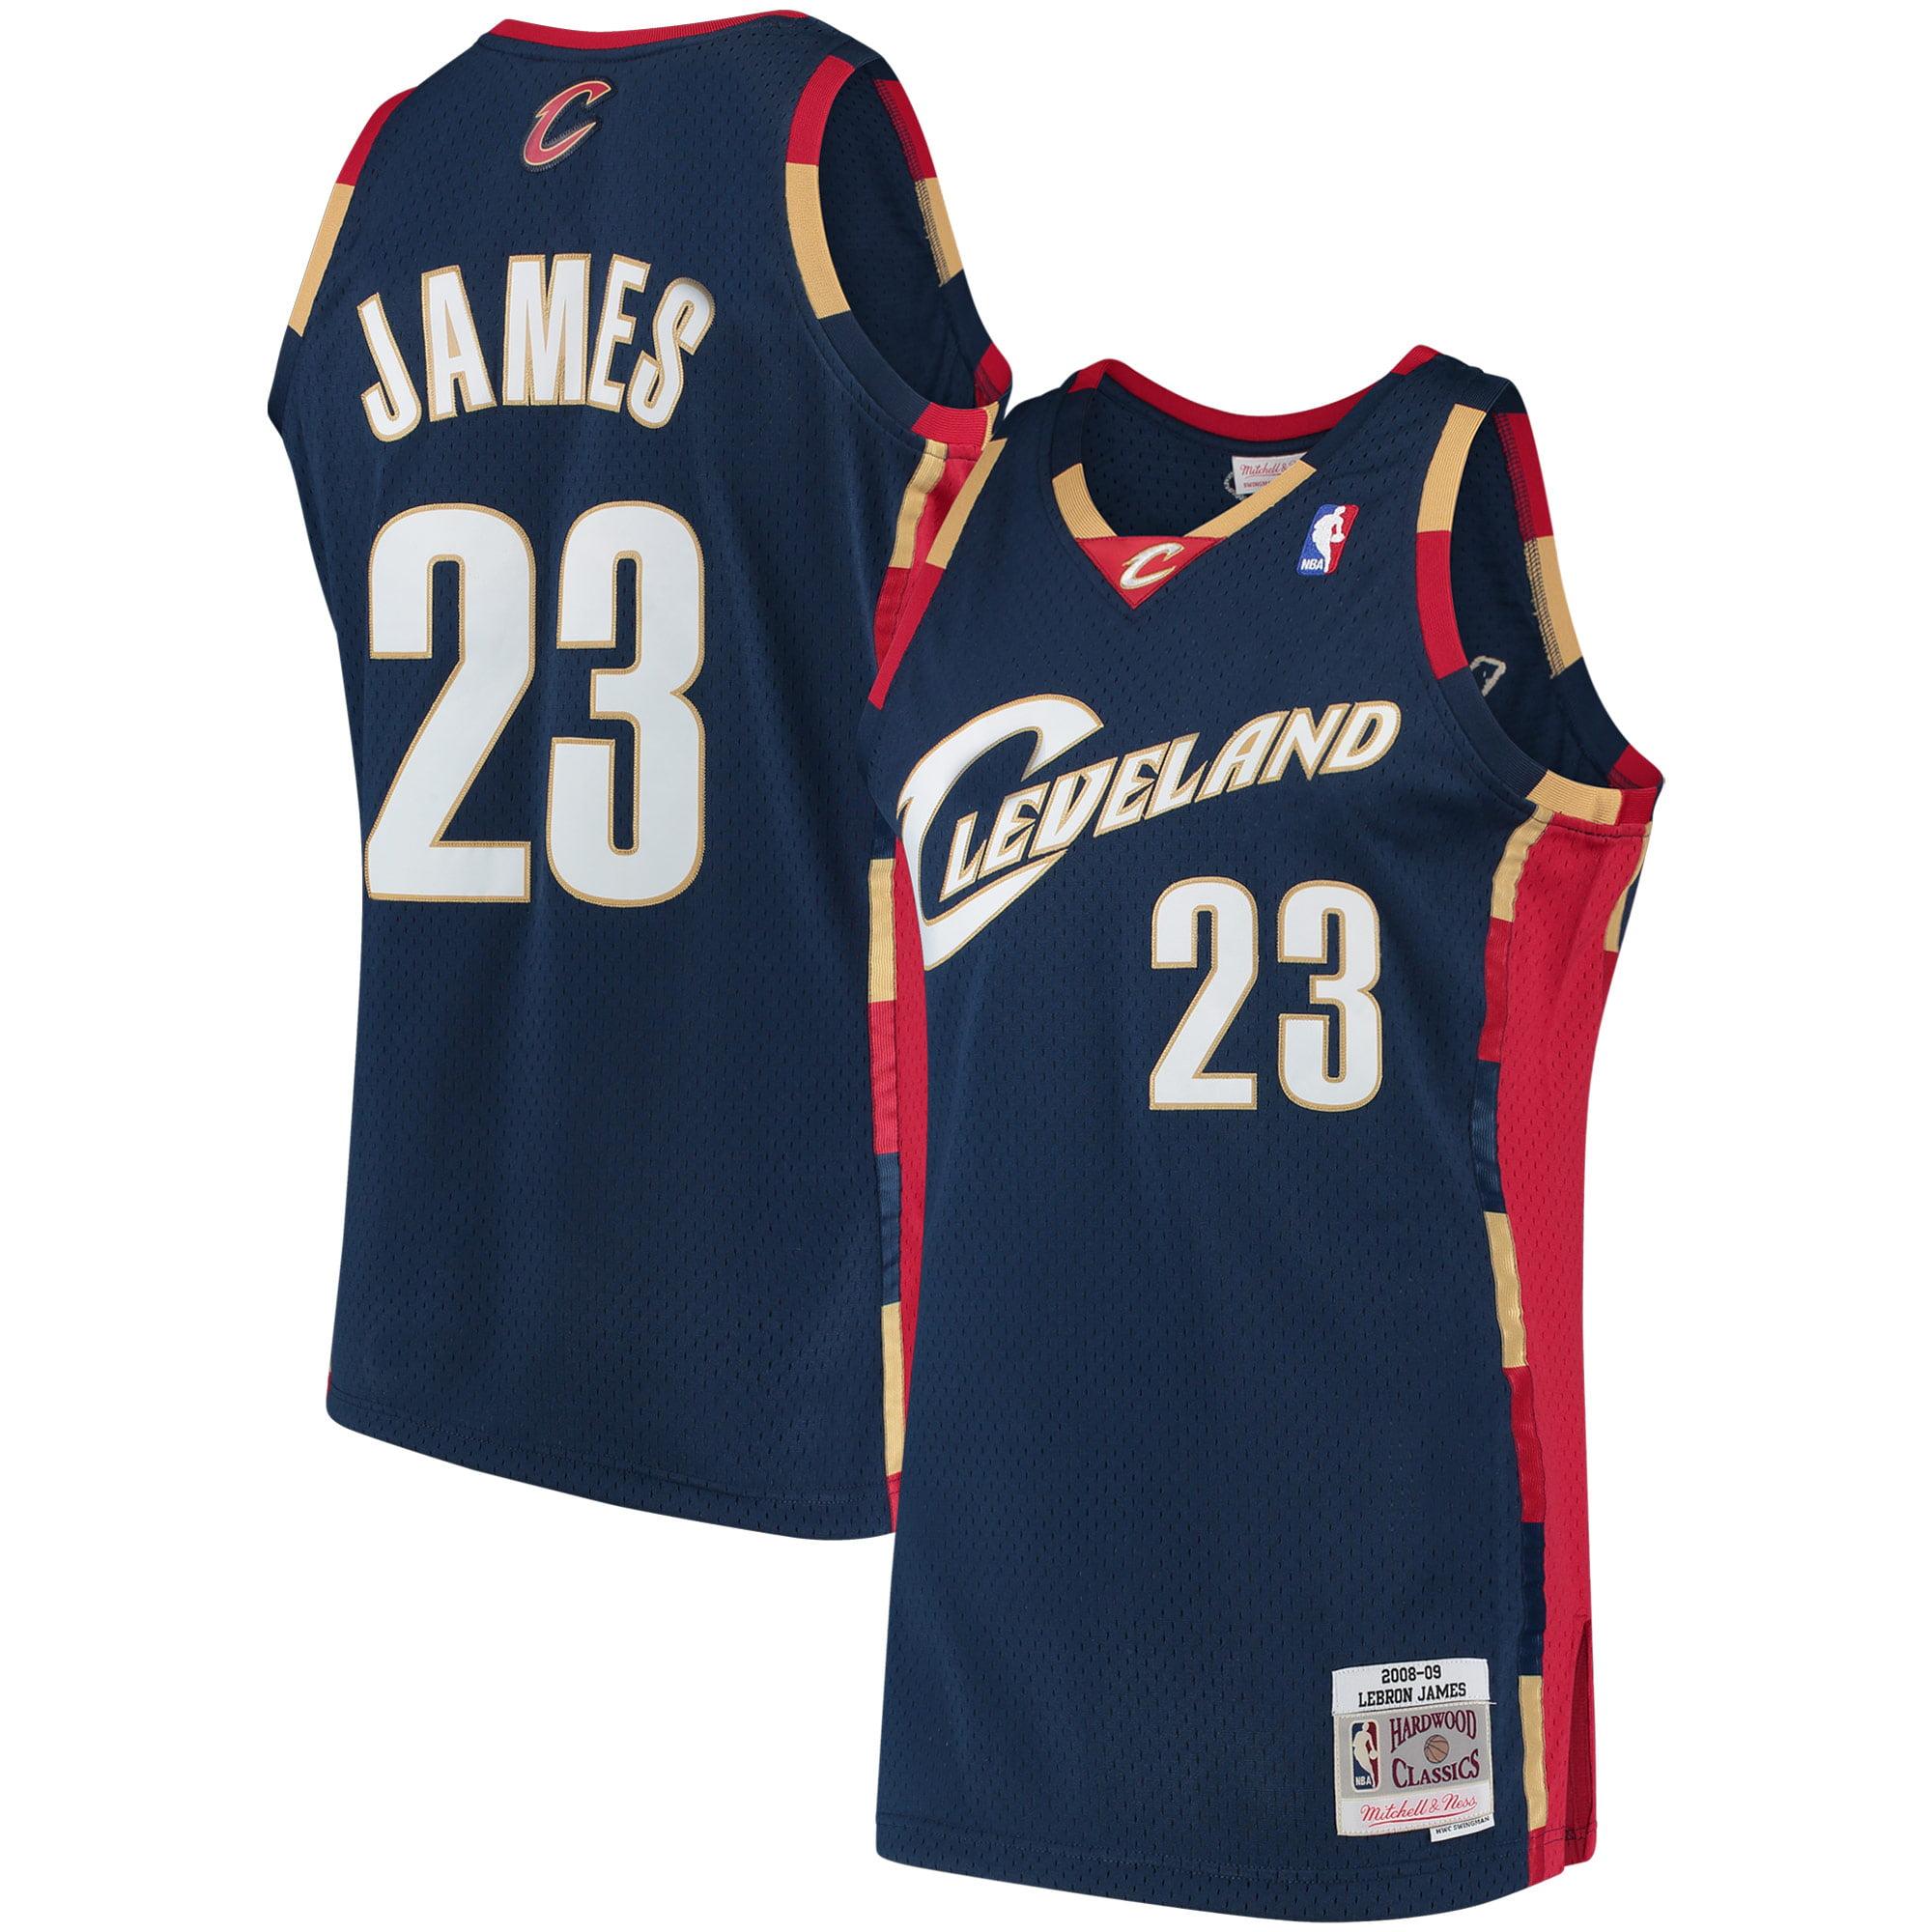 LeBron James Cleveland Cavaliers Mitchell & Ness 2008-09 Hardwood Classics Swingman Jersey - Navy